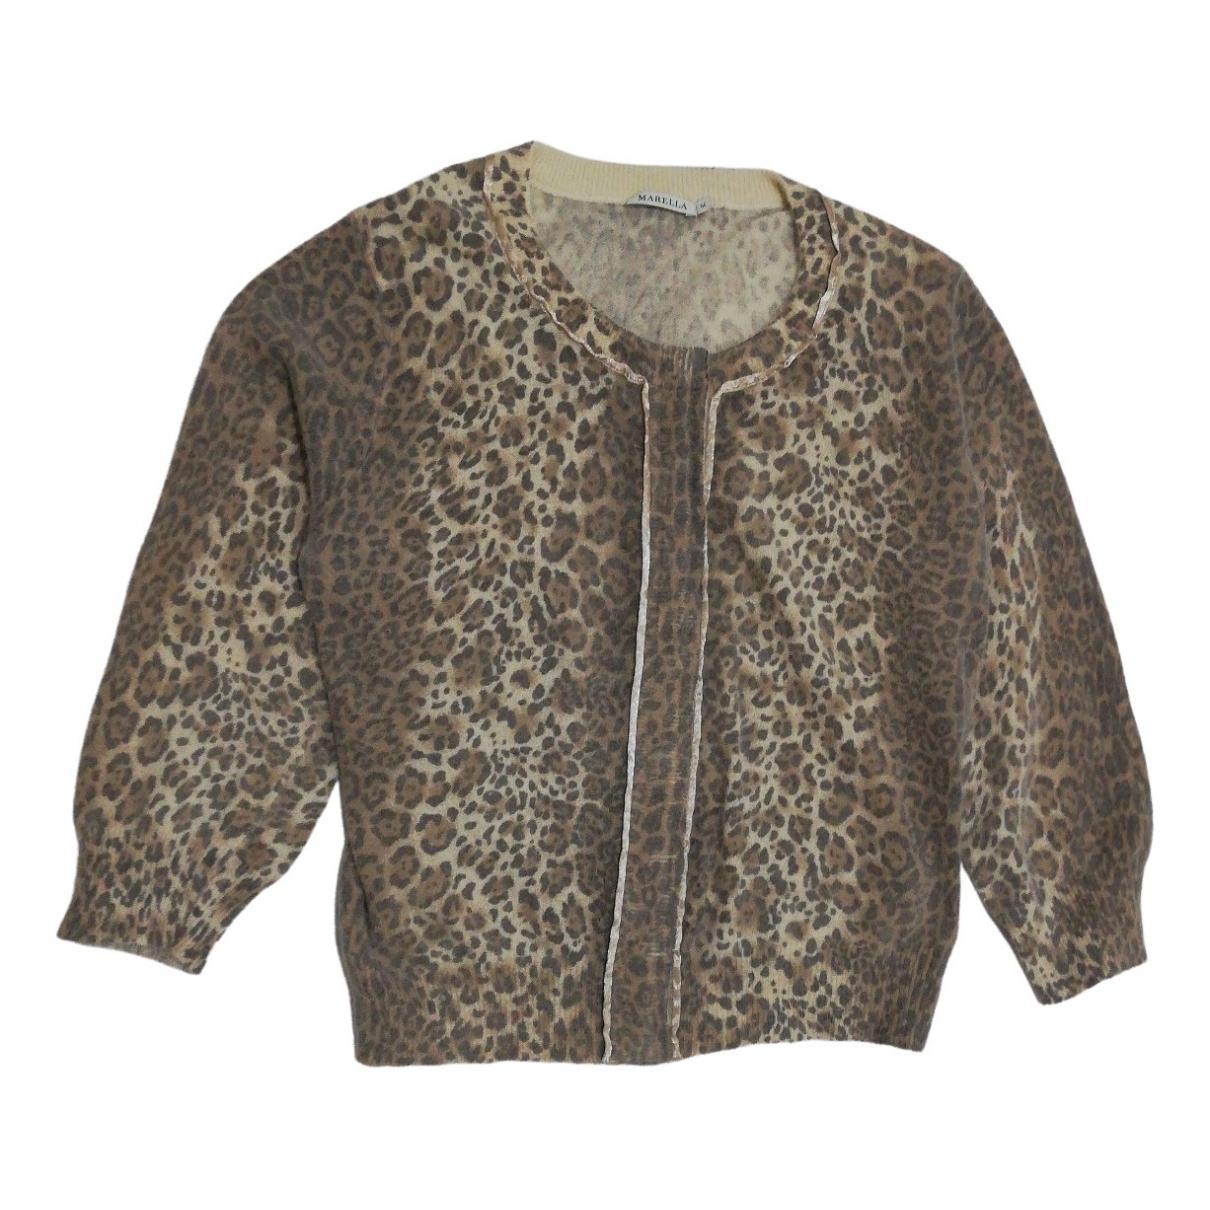 Marella - Pull   pour femme en coton - multicolore